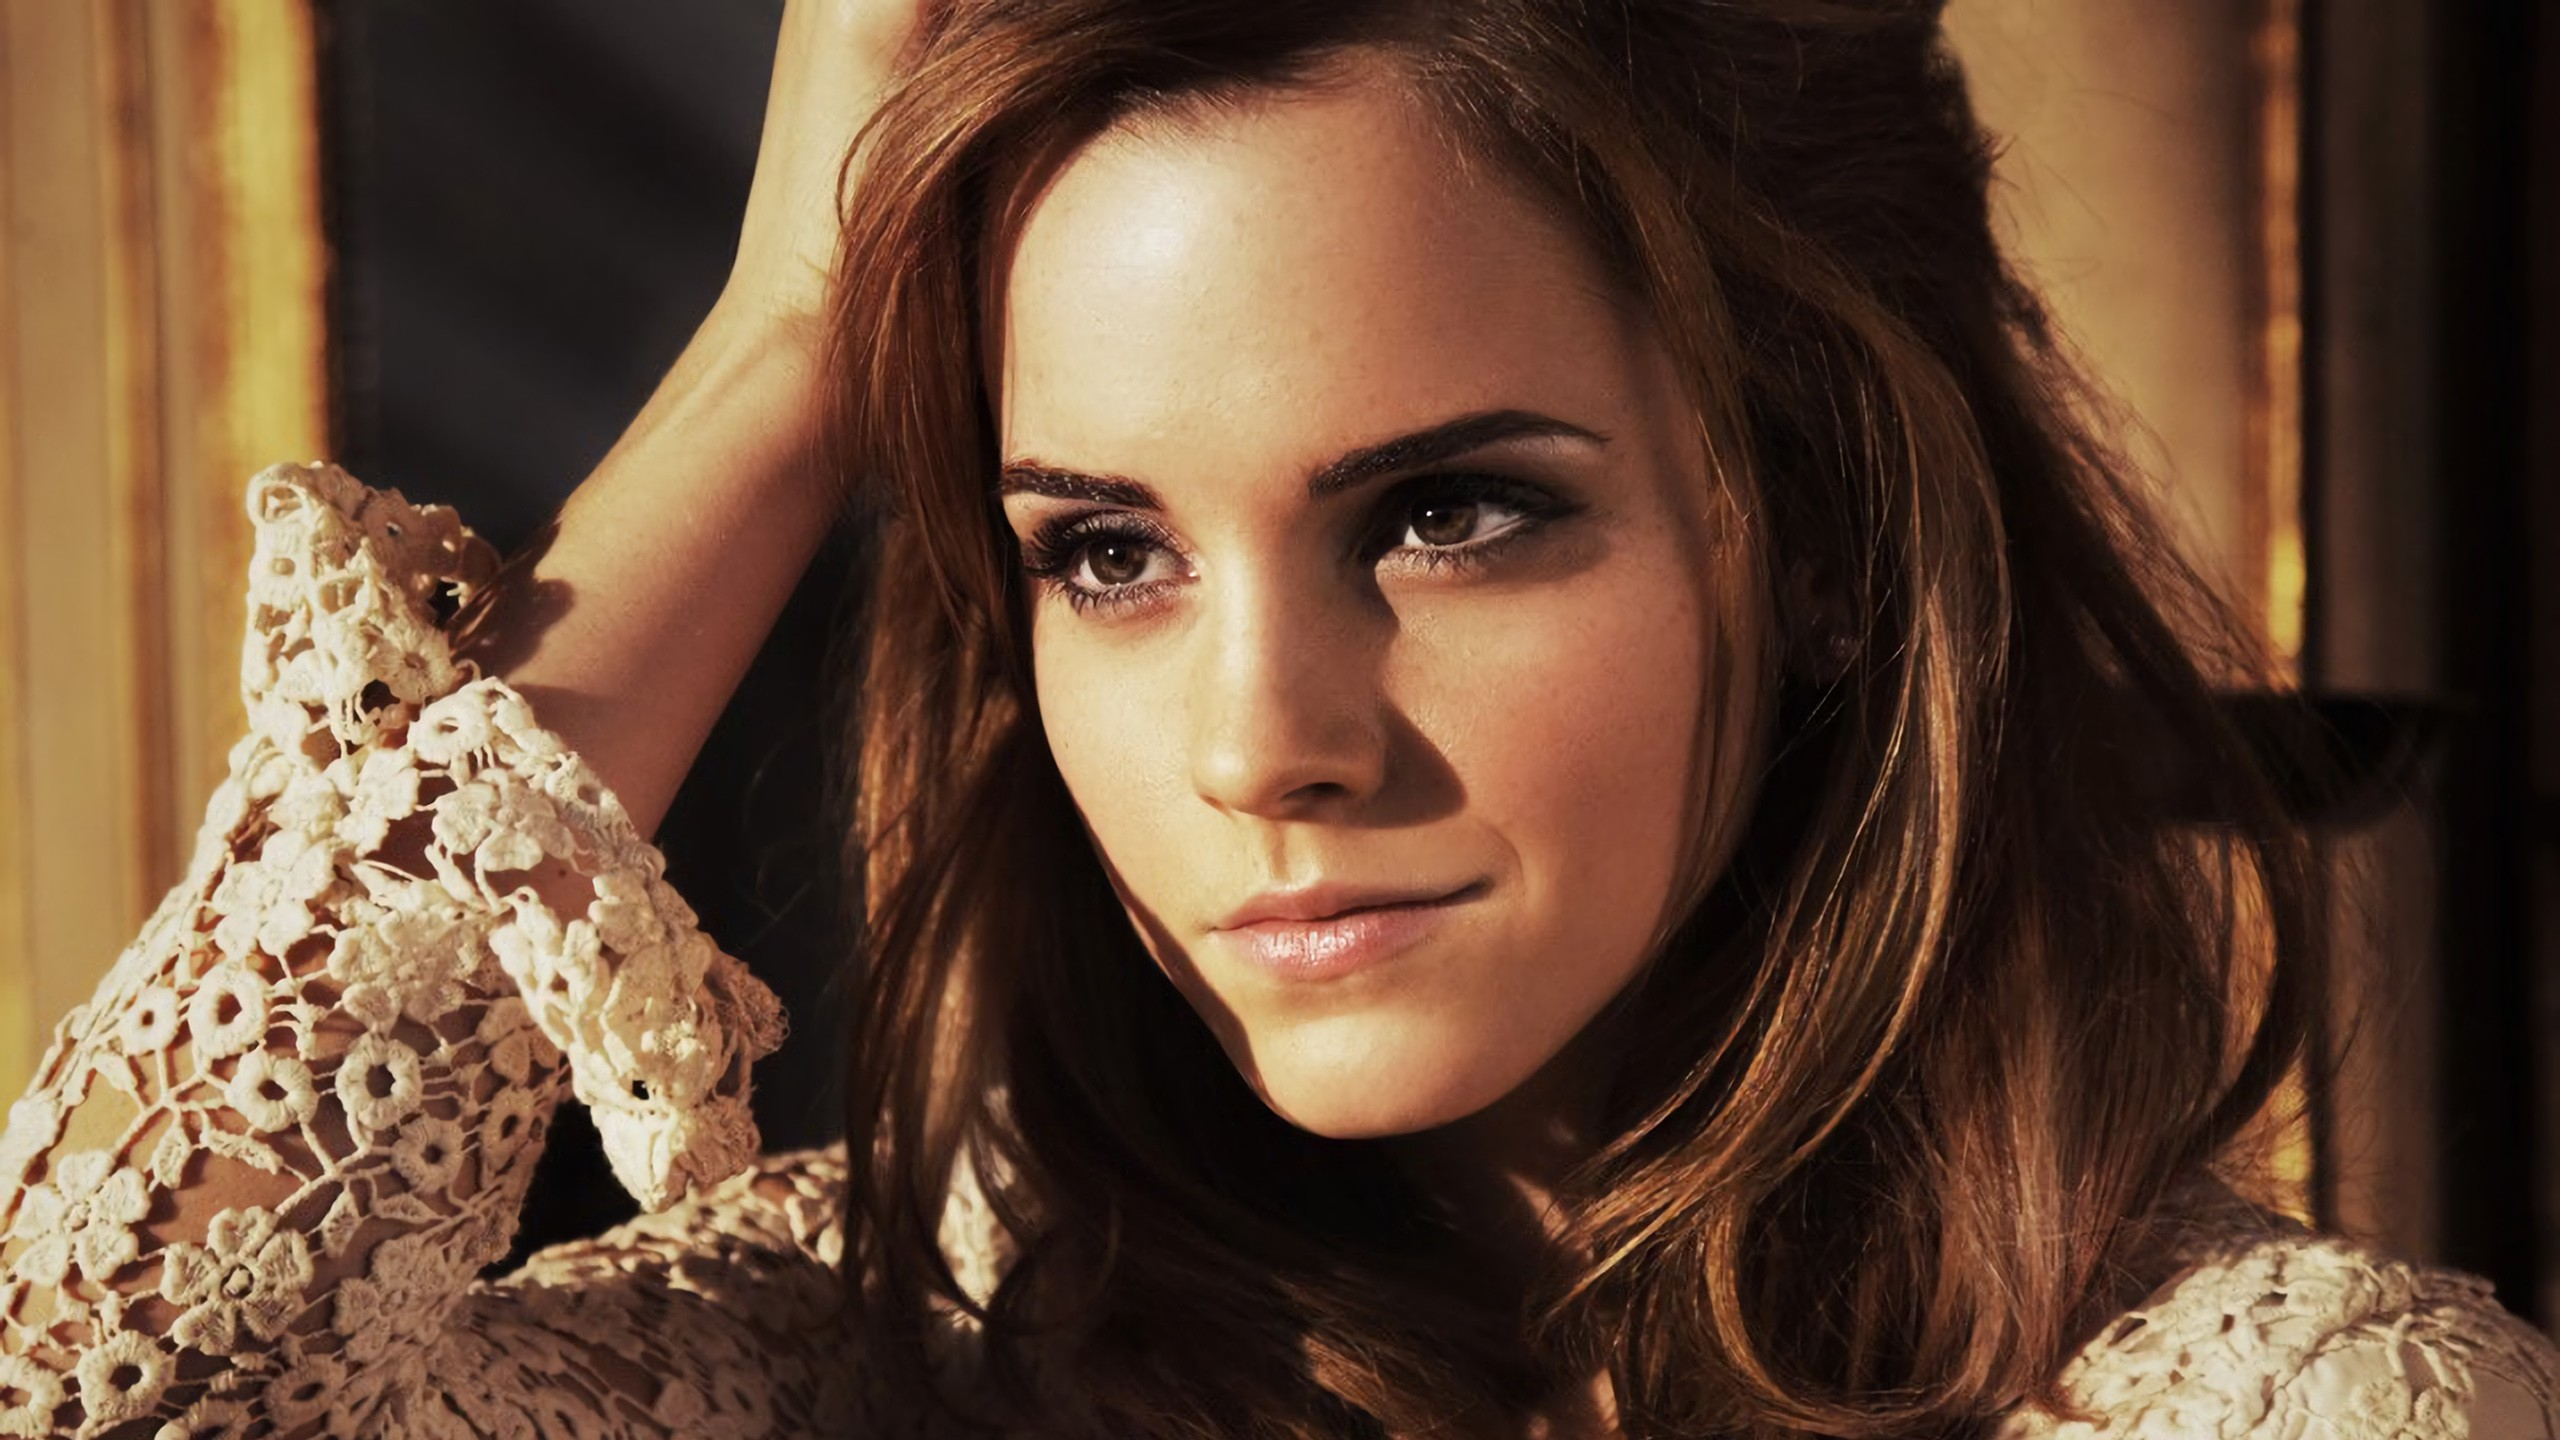 Emma Watson 19, HD Celebrities, 4k Wallpapers, Images